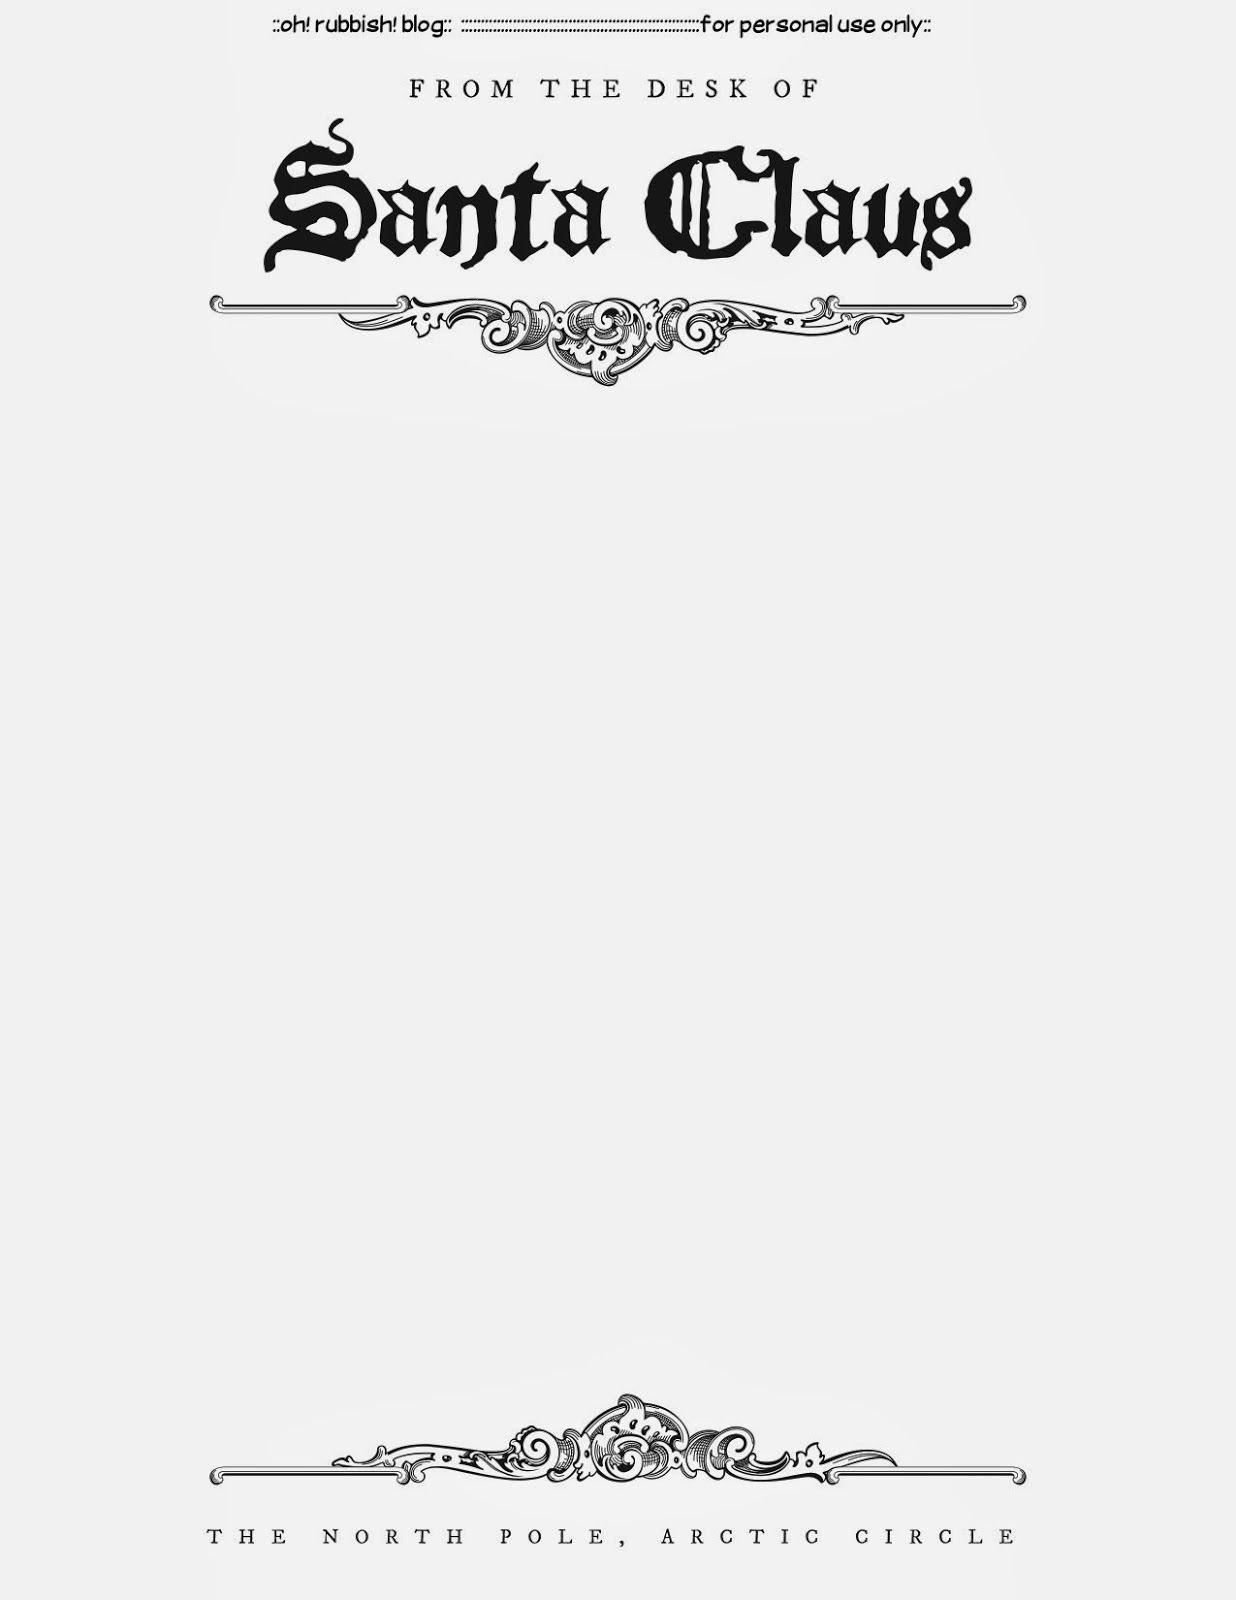 Santa Letter Templates  Christmas Printables   Santa Letter Intended For Free Printable Letter From Santa Template